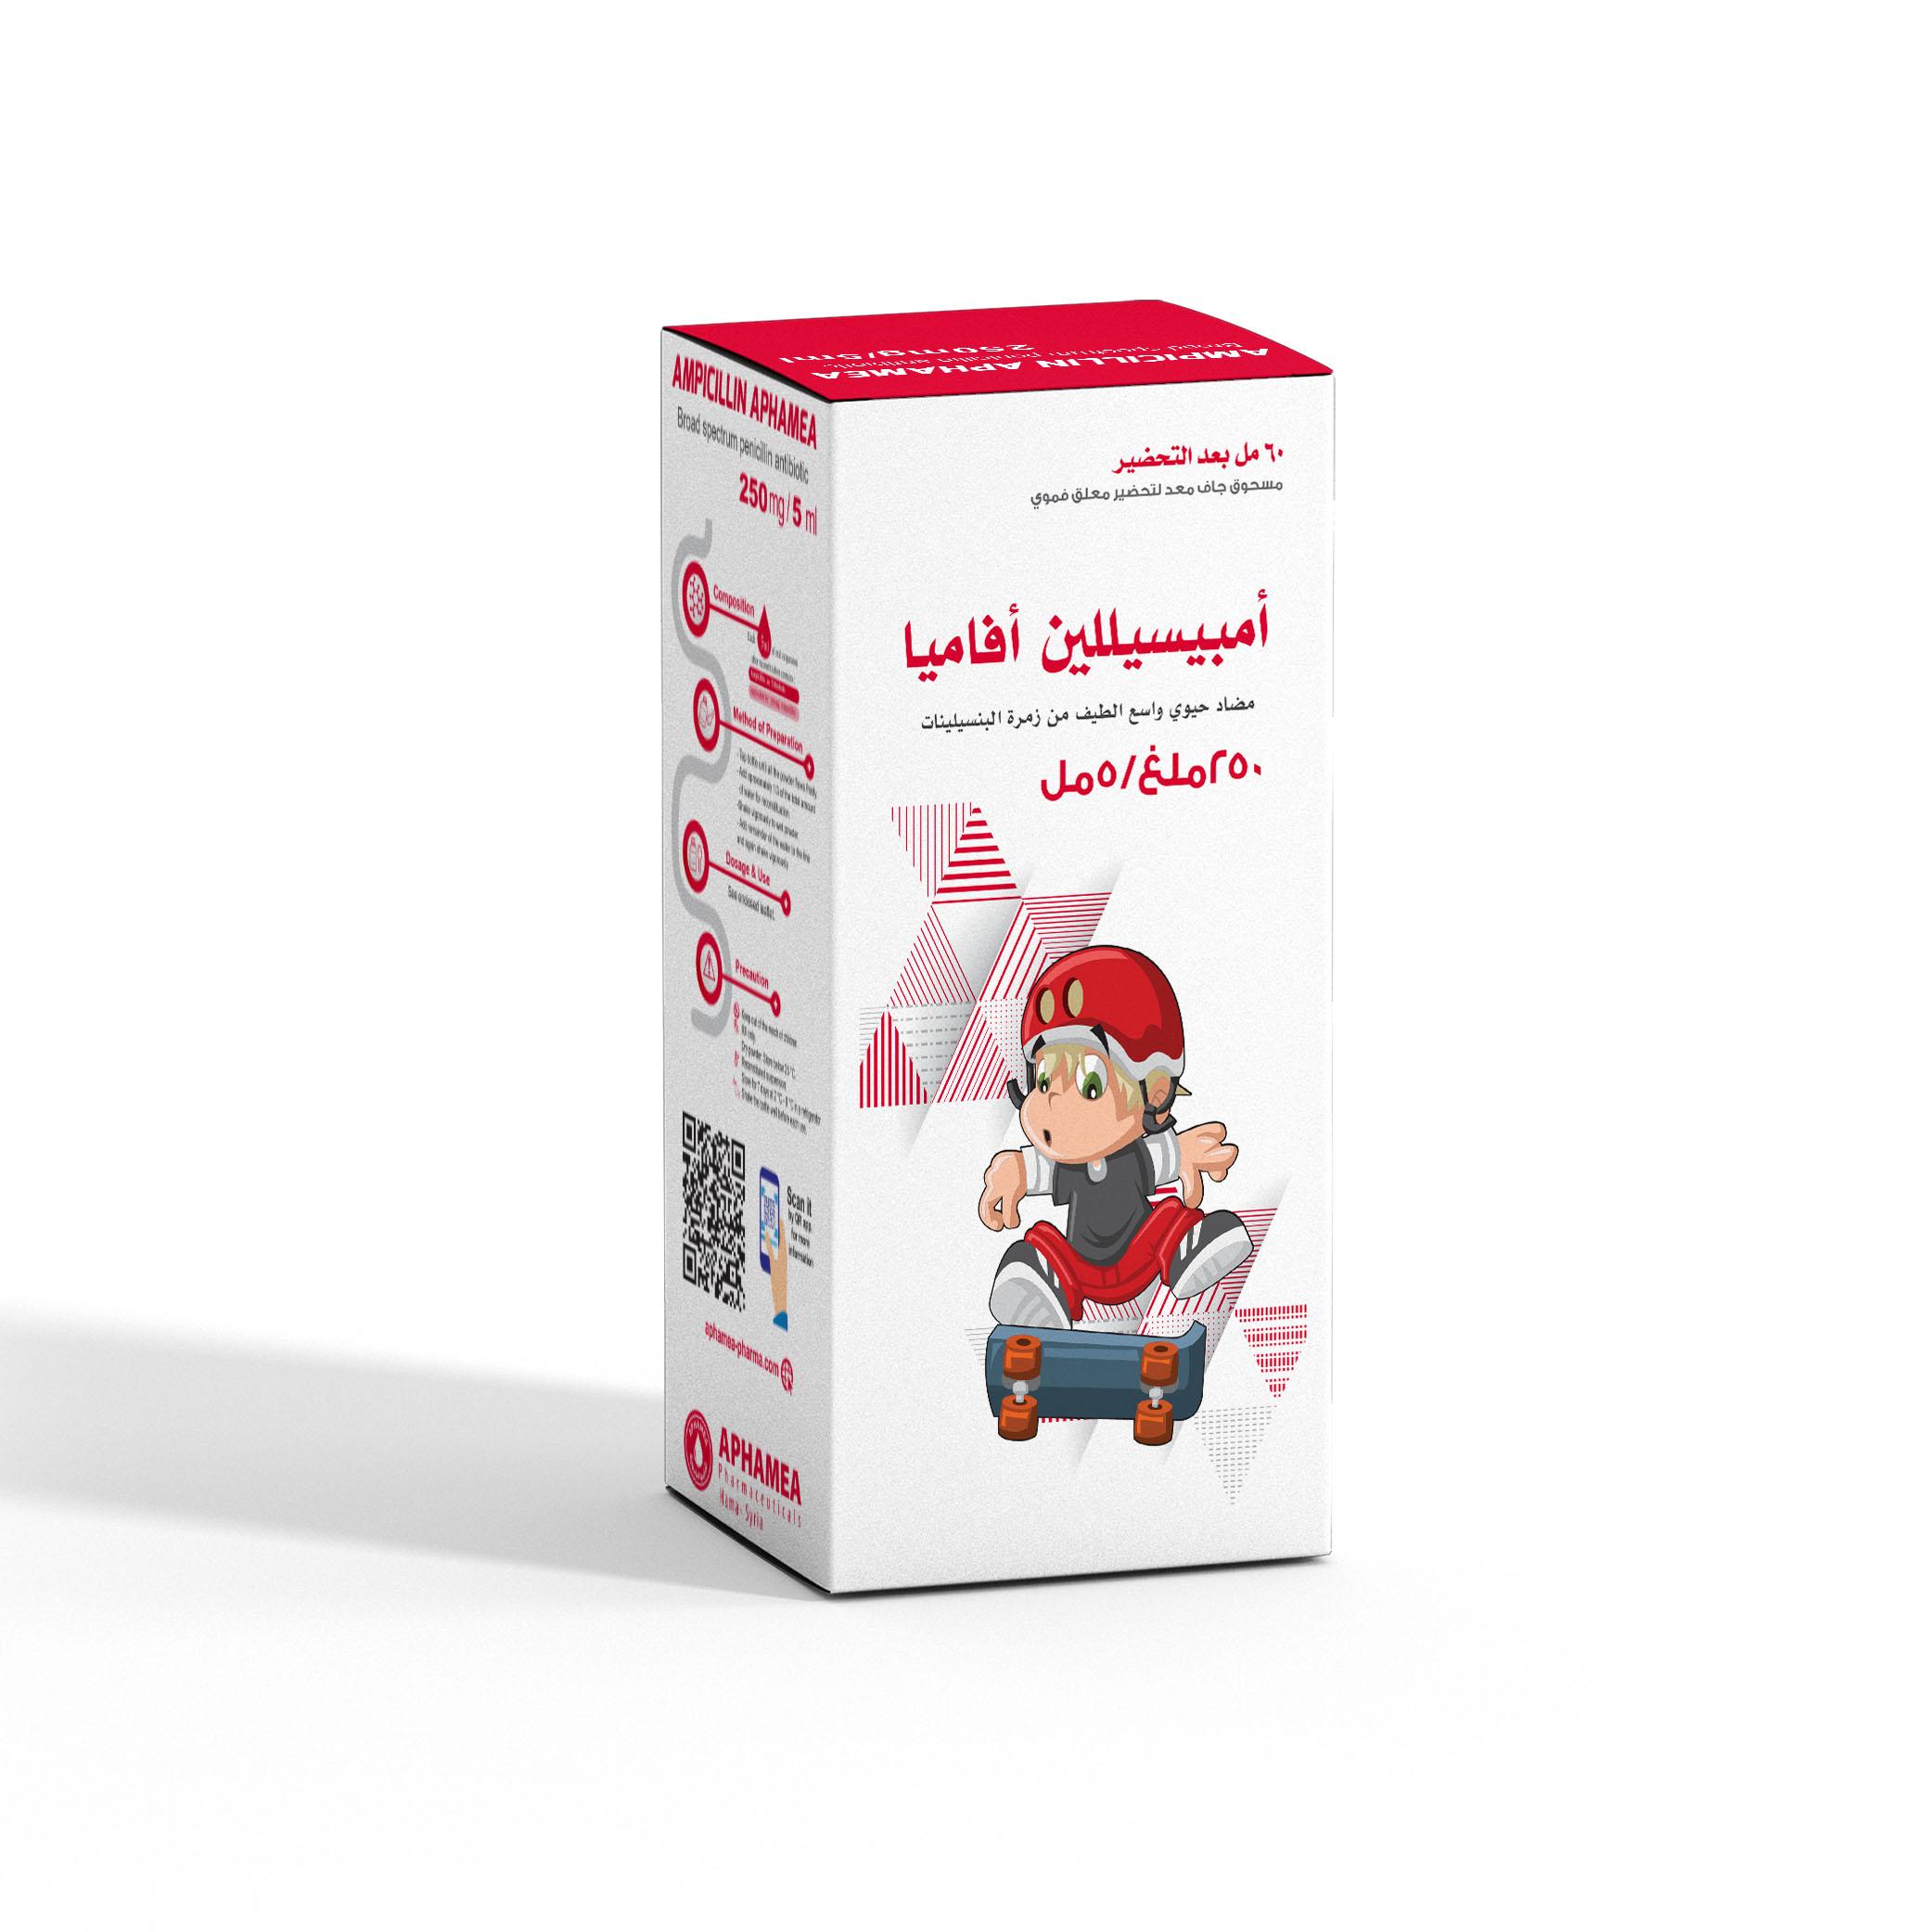 Aphamea Pharmaceuticals